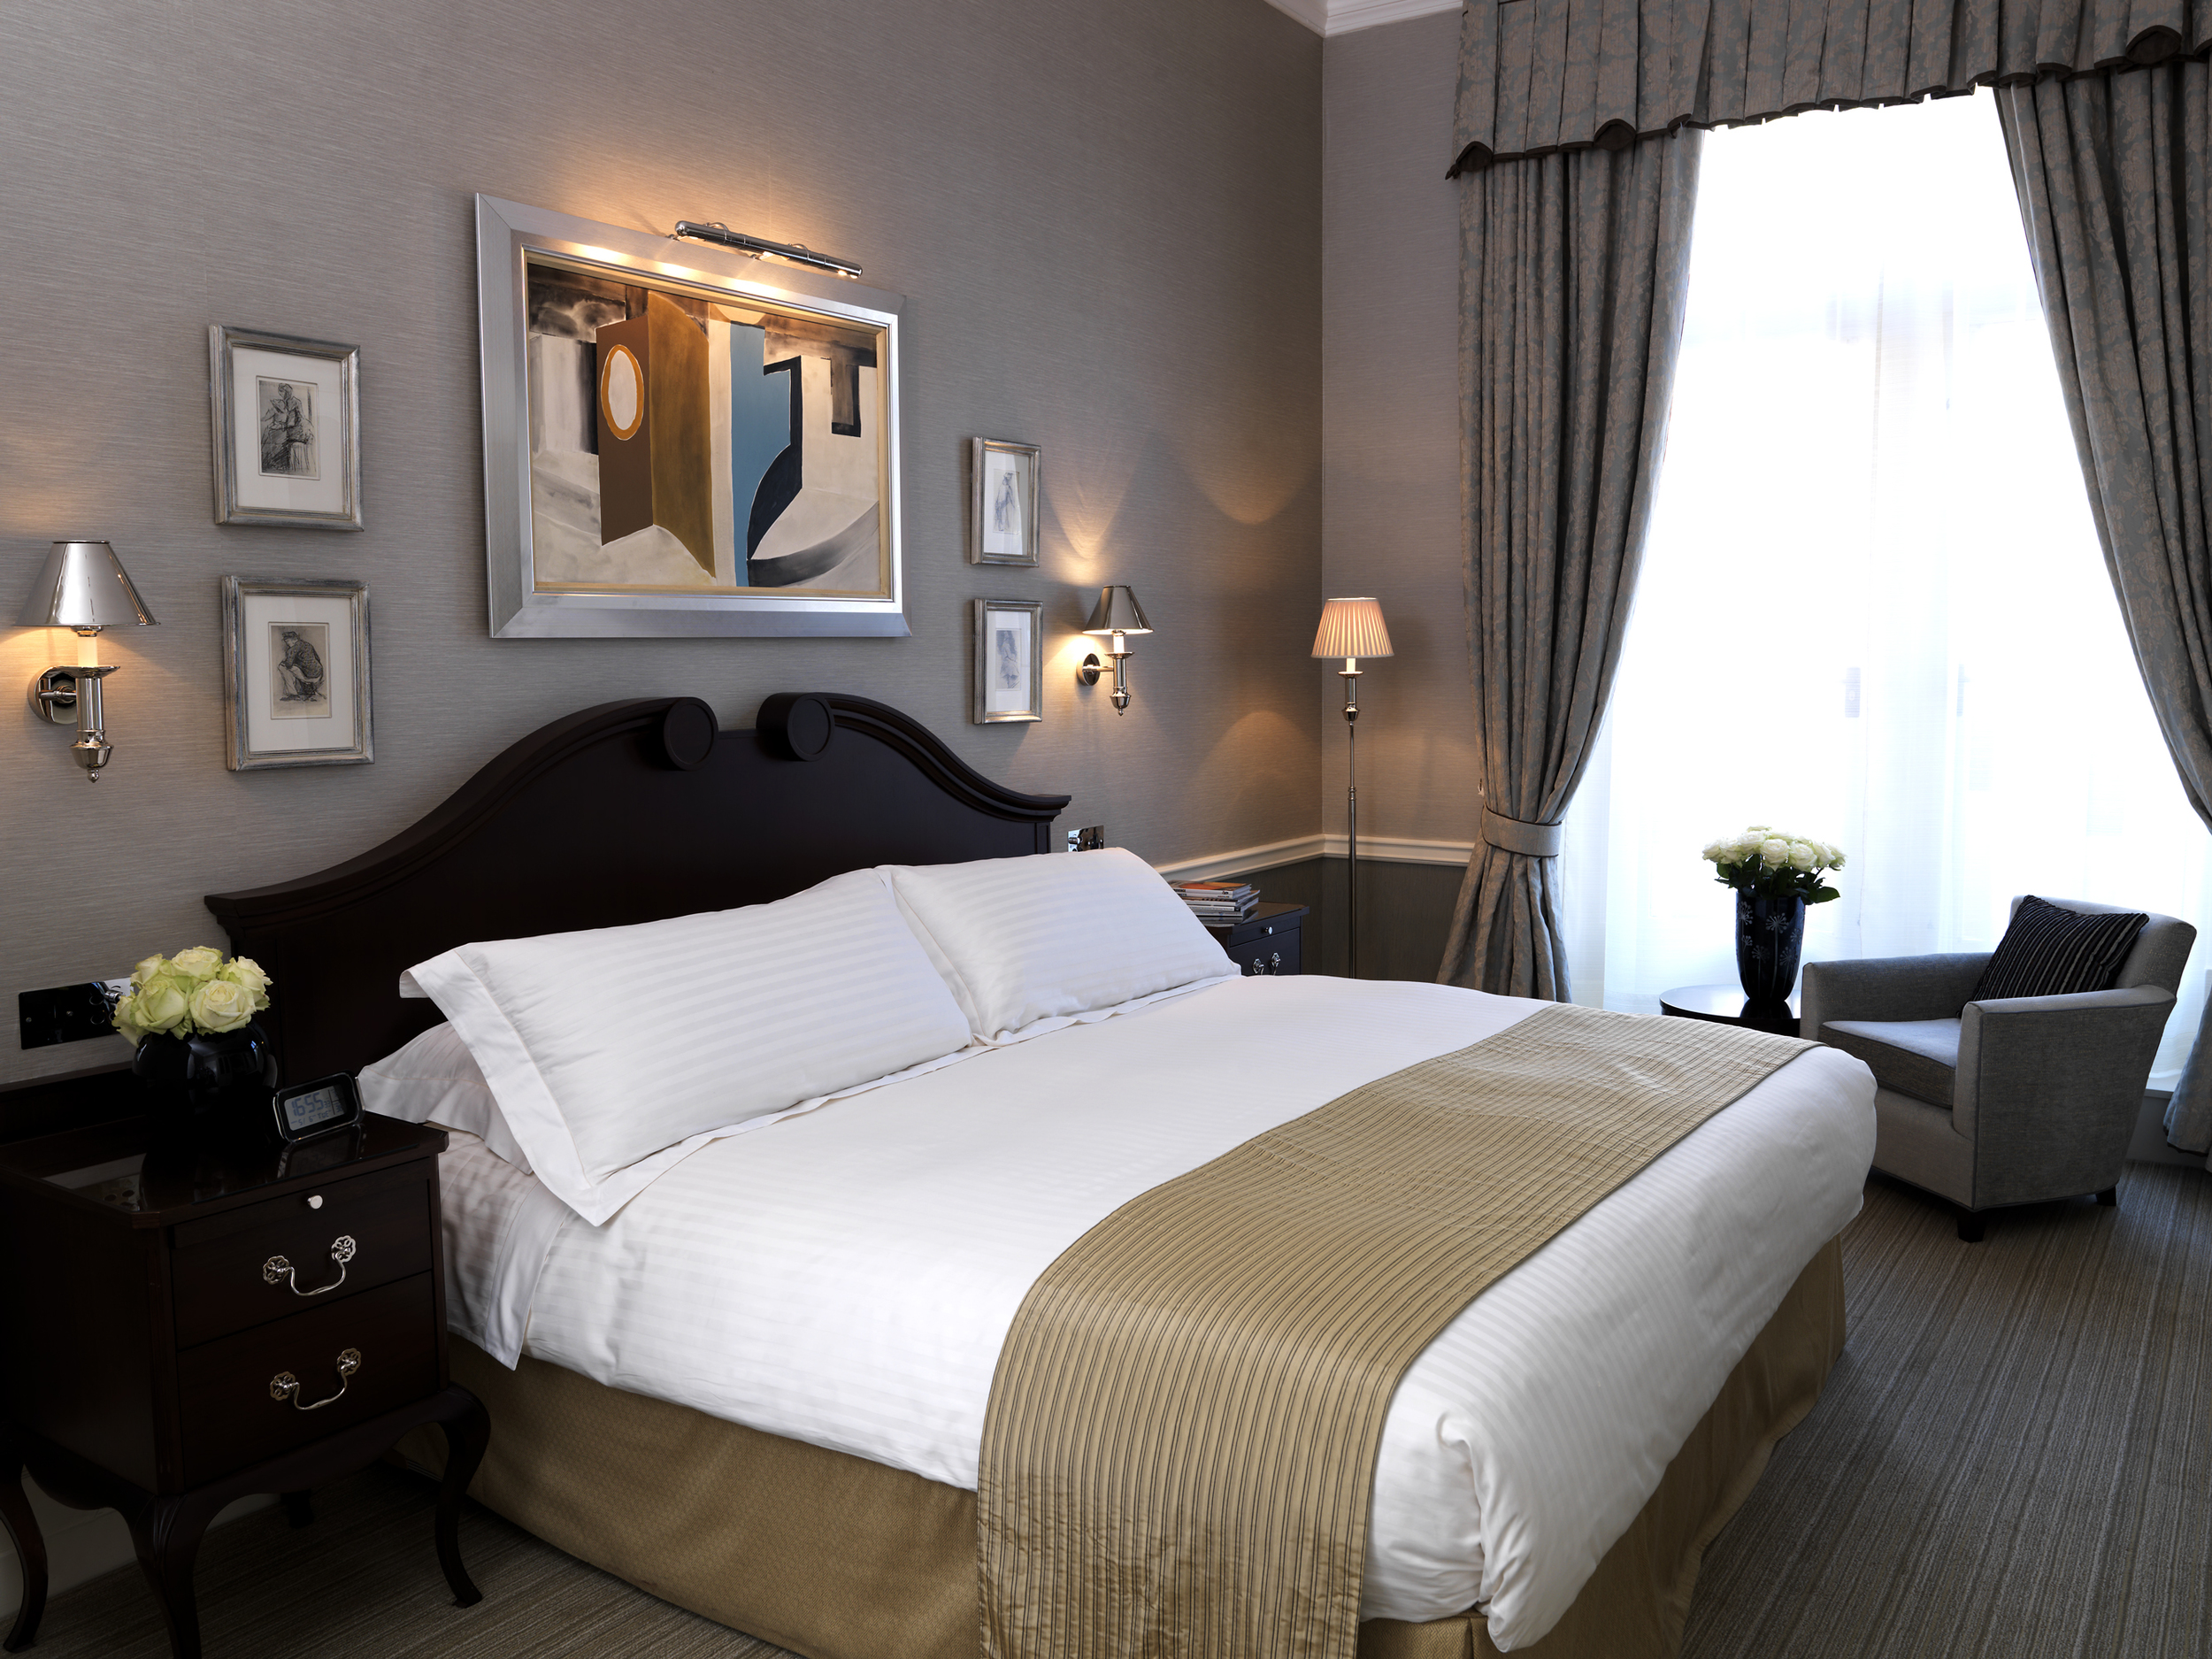 Connaught Carlos Suite bed 102 11_1.jpg